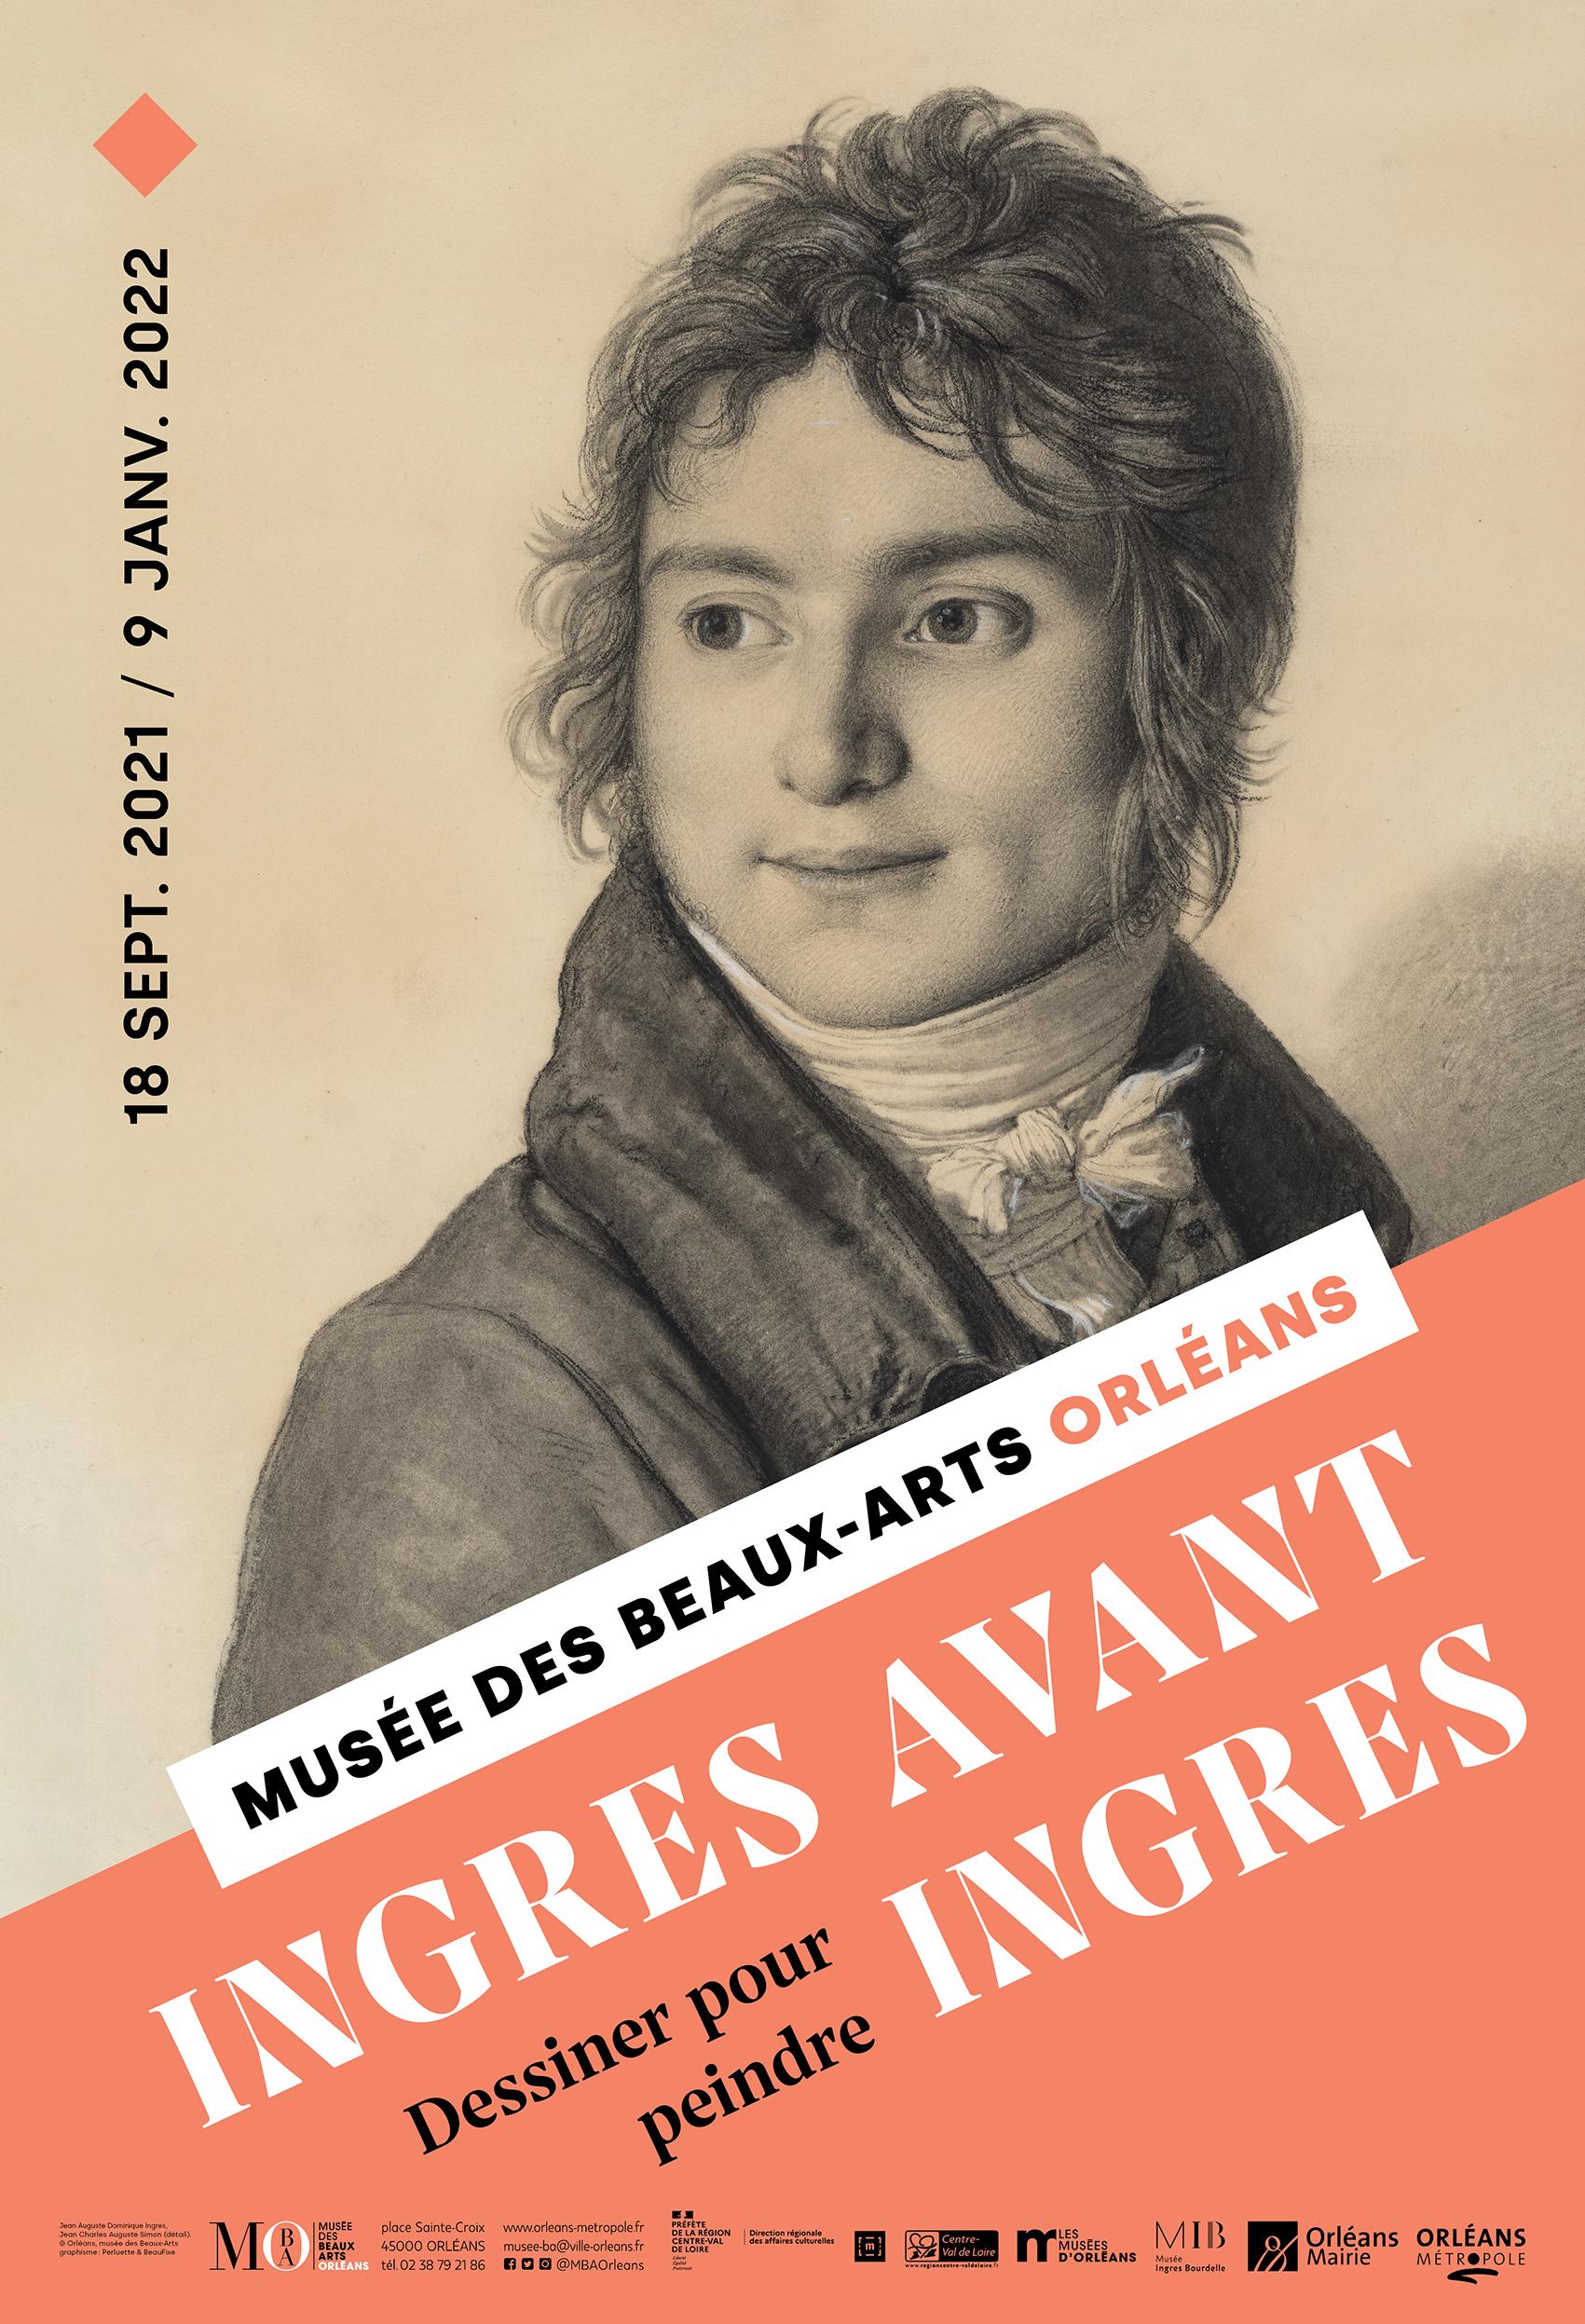 "EXPOSITION & VISITES / ""Ingres avant Ingres - dessiner pour peindre"""